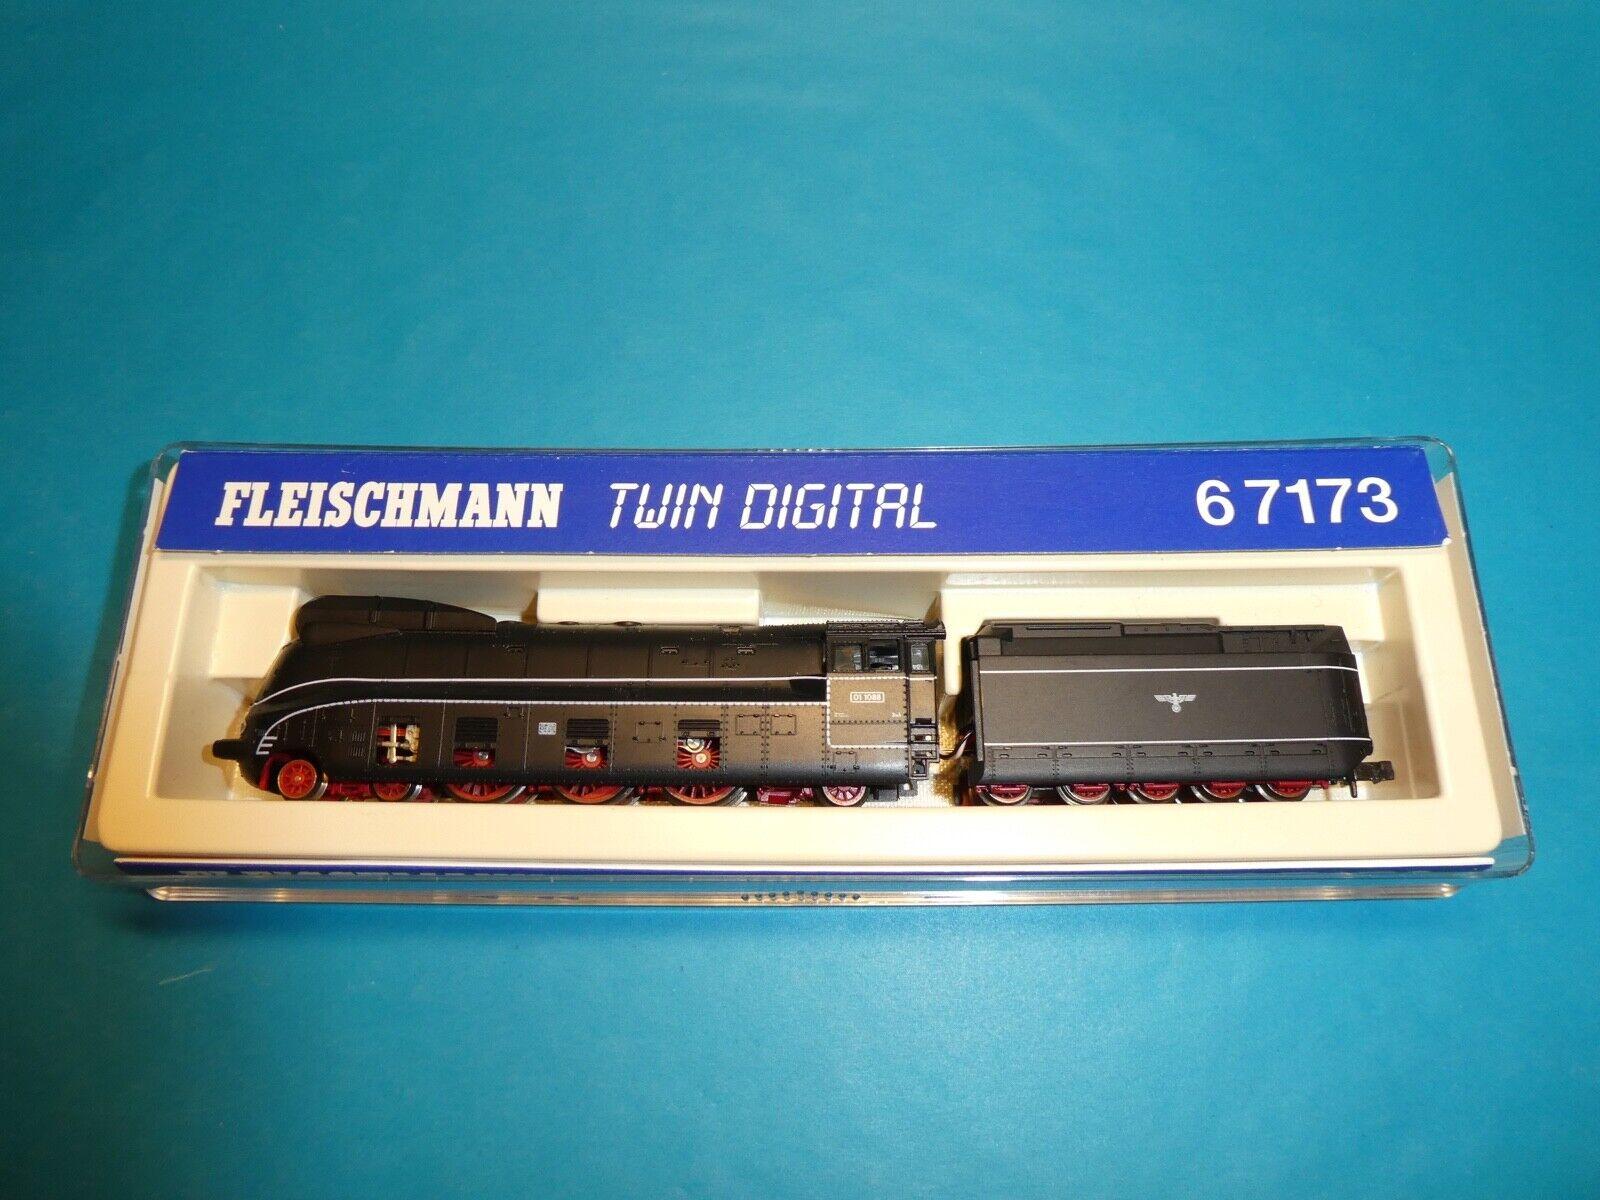 Fleischmann n 6 7171 Twin digital  br01 1088 DRG máquina de vapor EP. II